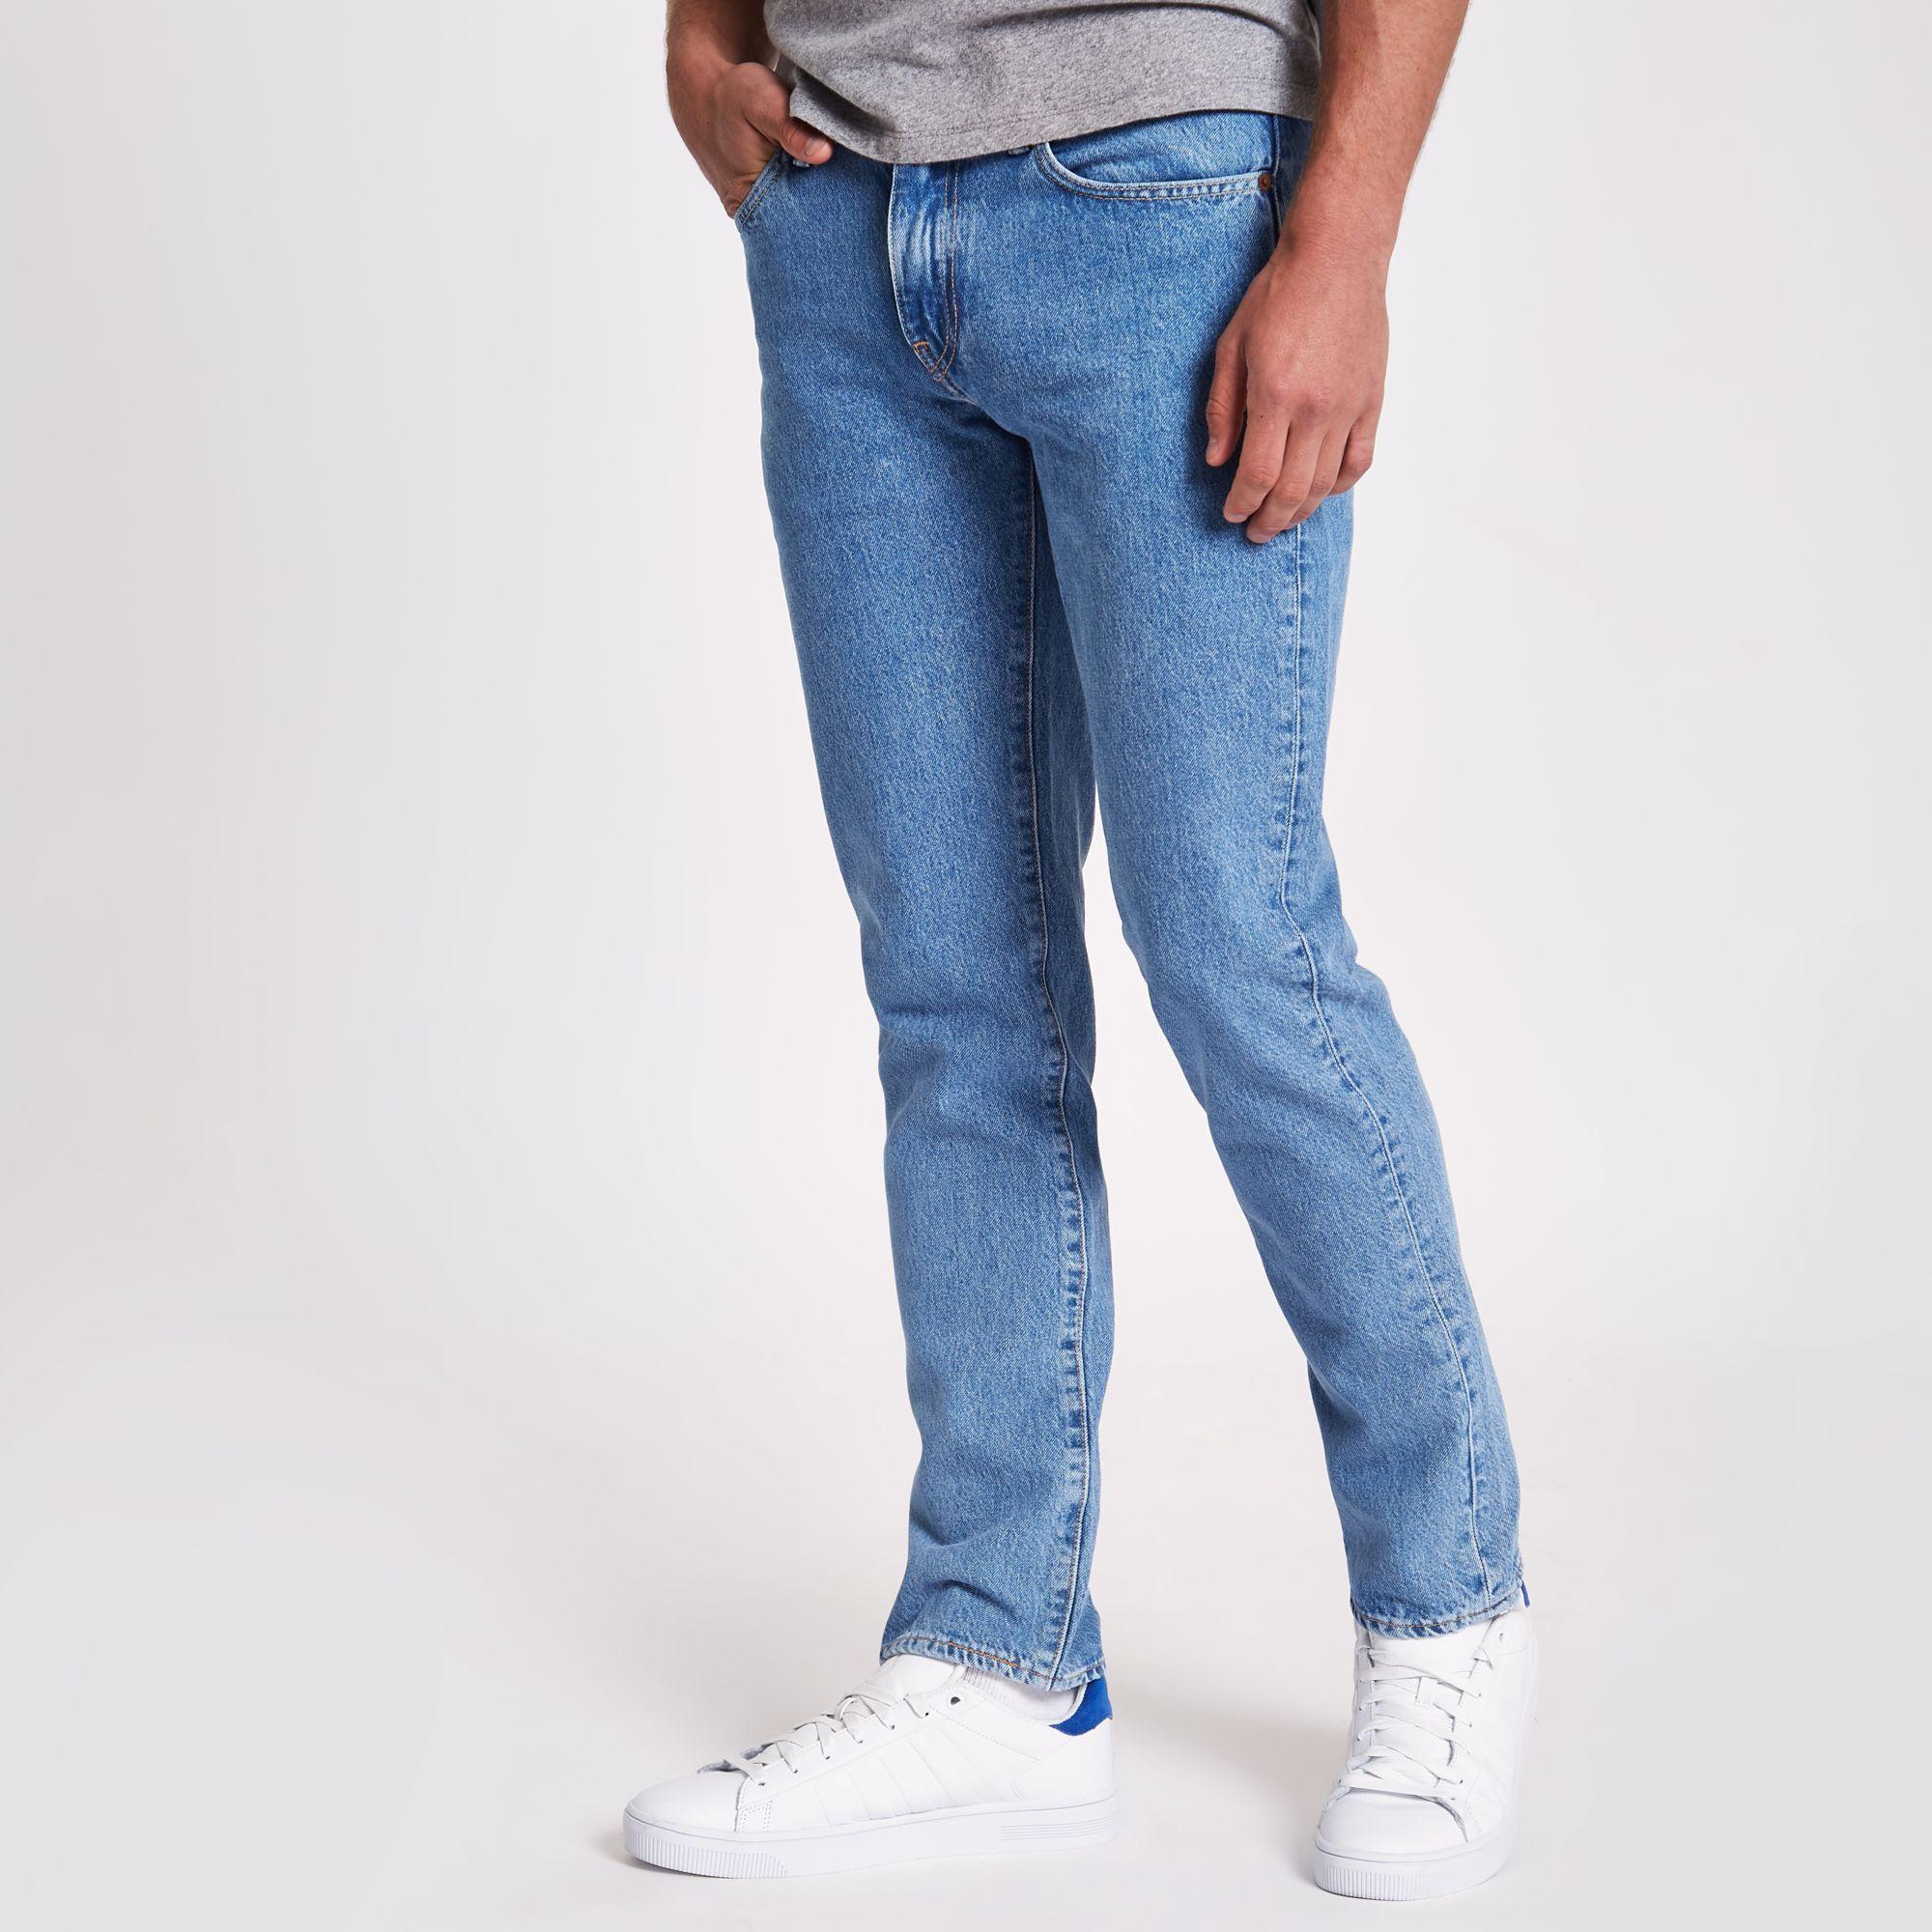 9f2dd8c2925 Levi's Light Blue 511 Slim Fit Jeans in Blue for Men - Lyst